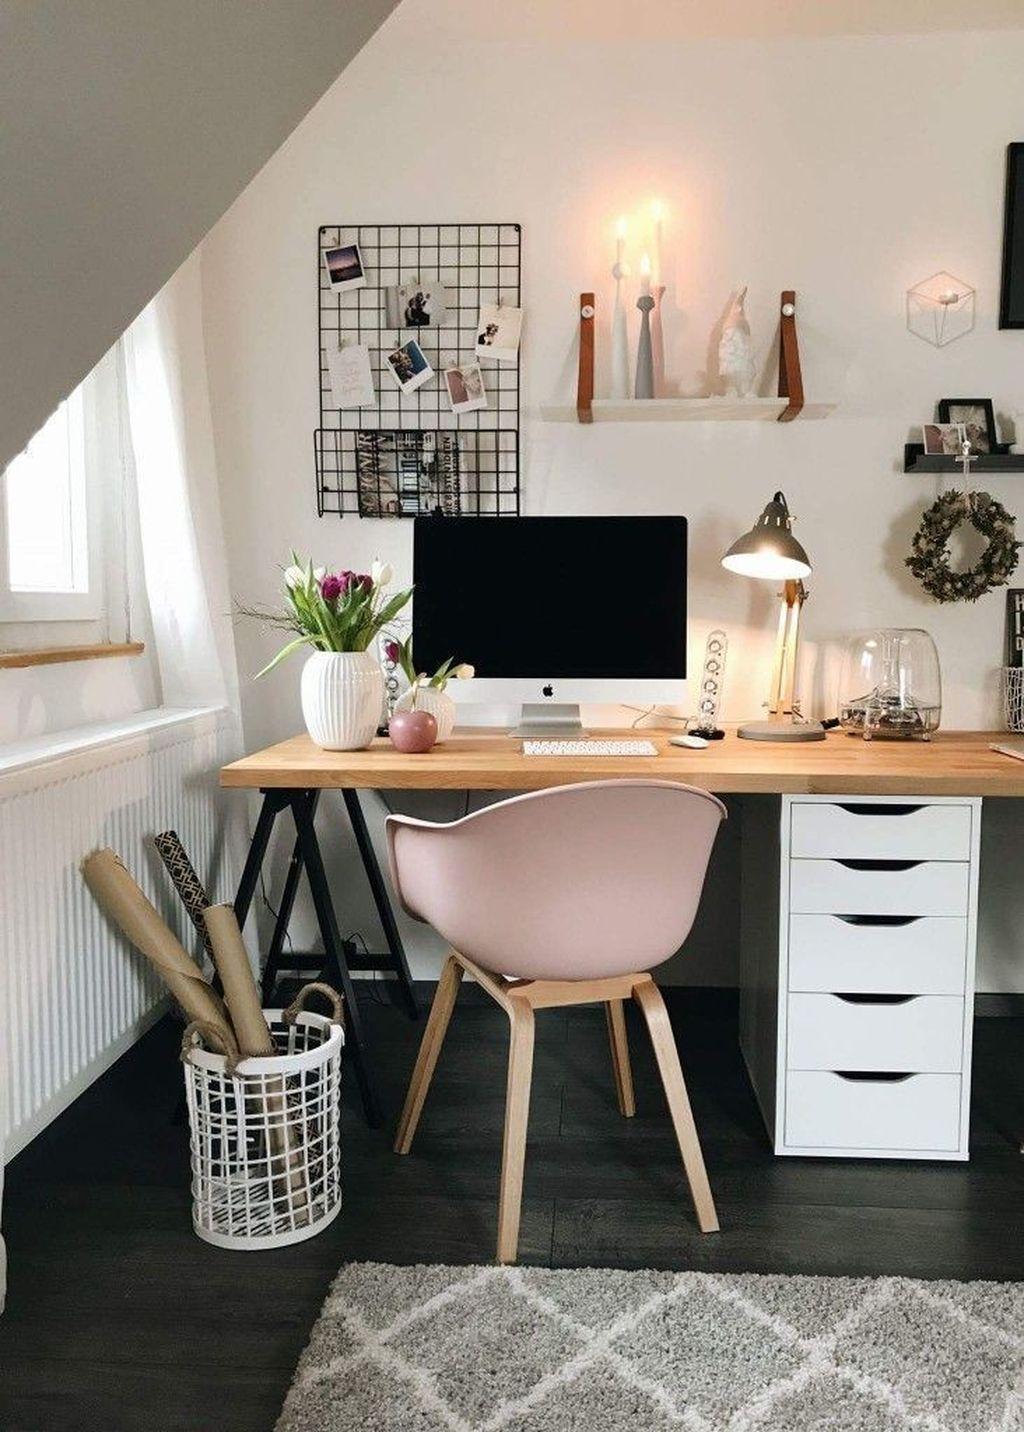 Awesome 20 Shabby Chic Diy Home Decor Ideas Study Room Decor Cute Desk Decor Brown Rooms